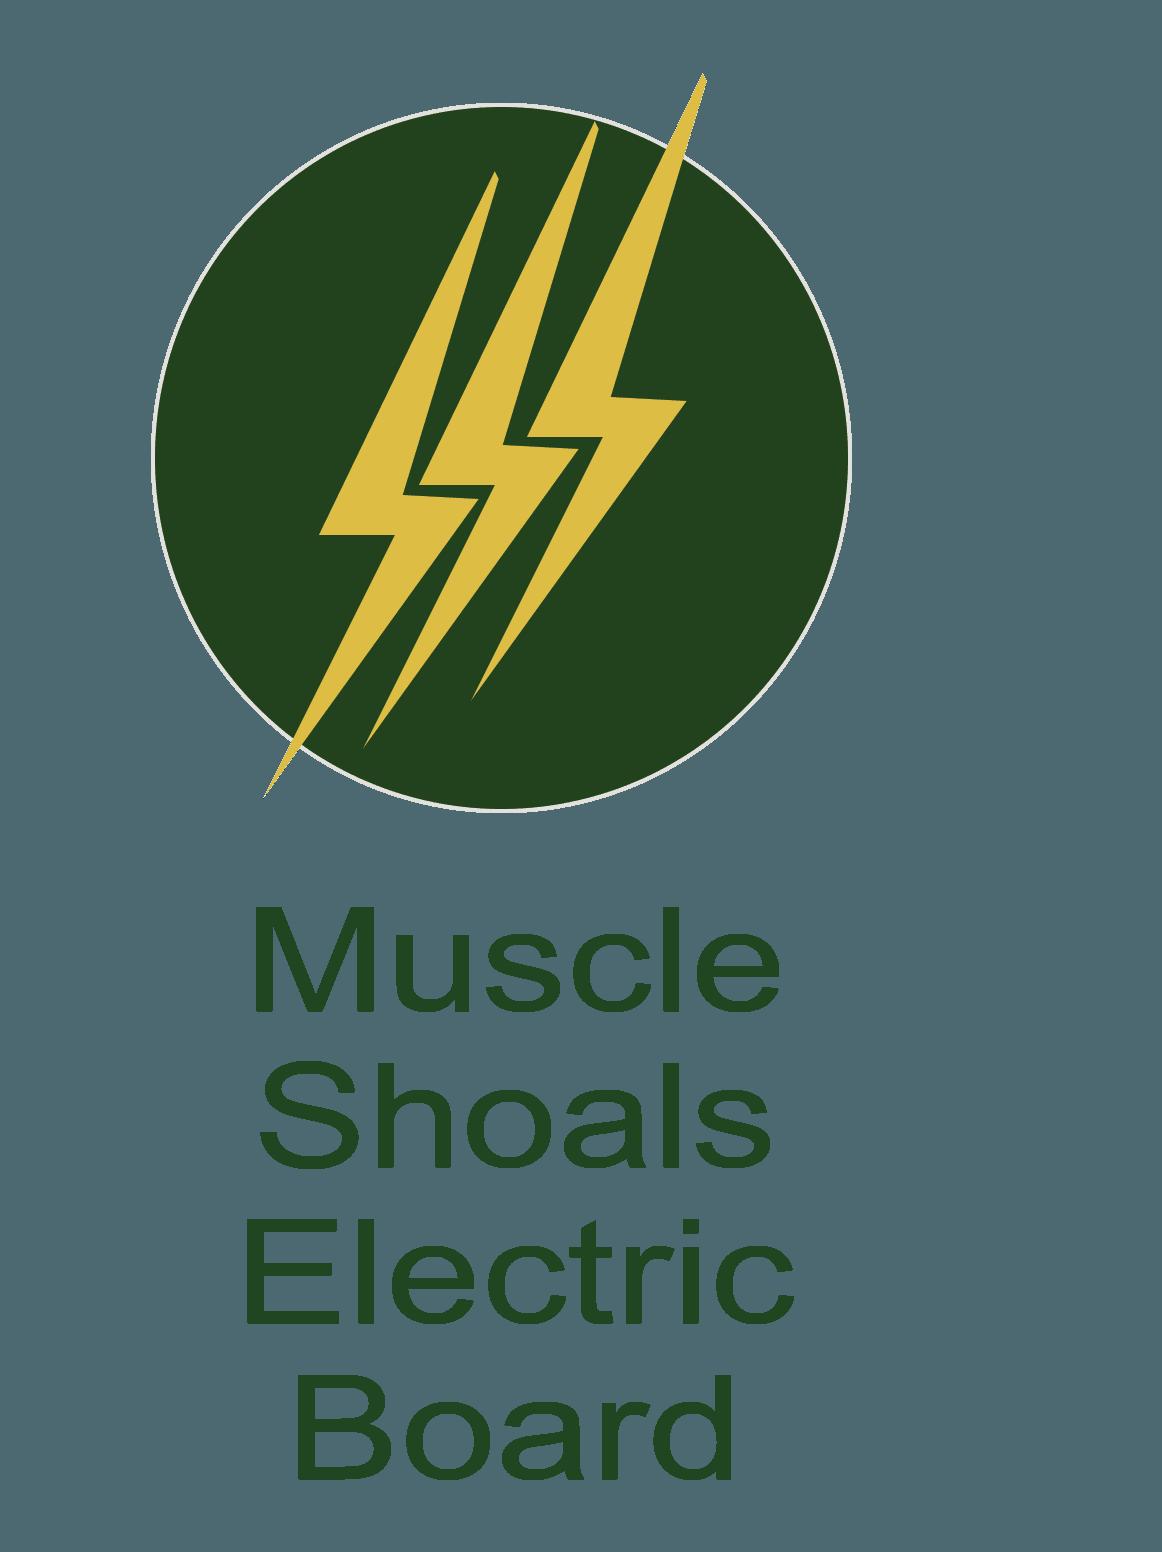 Muscle Shoals Electric Board